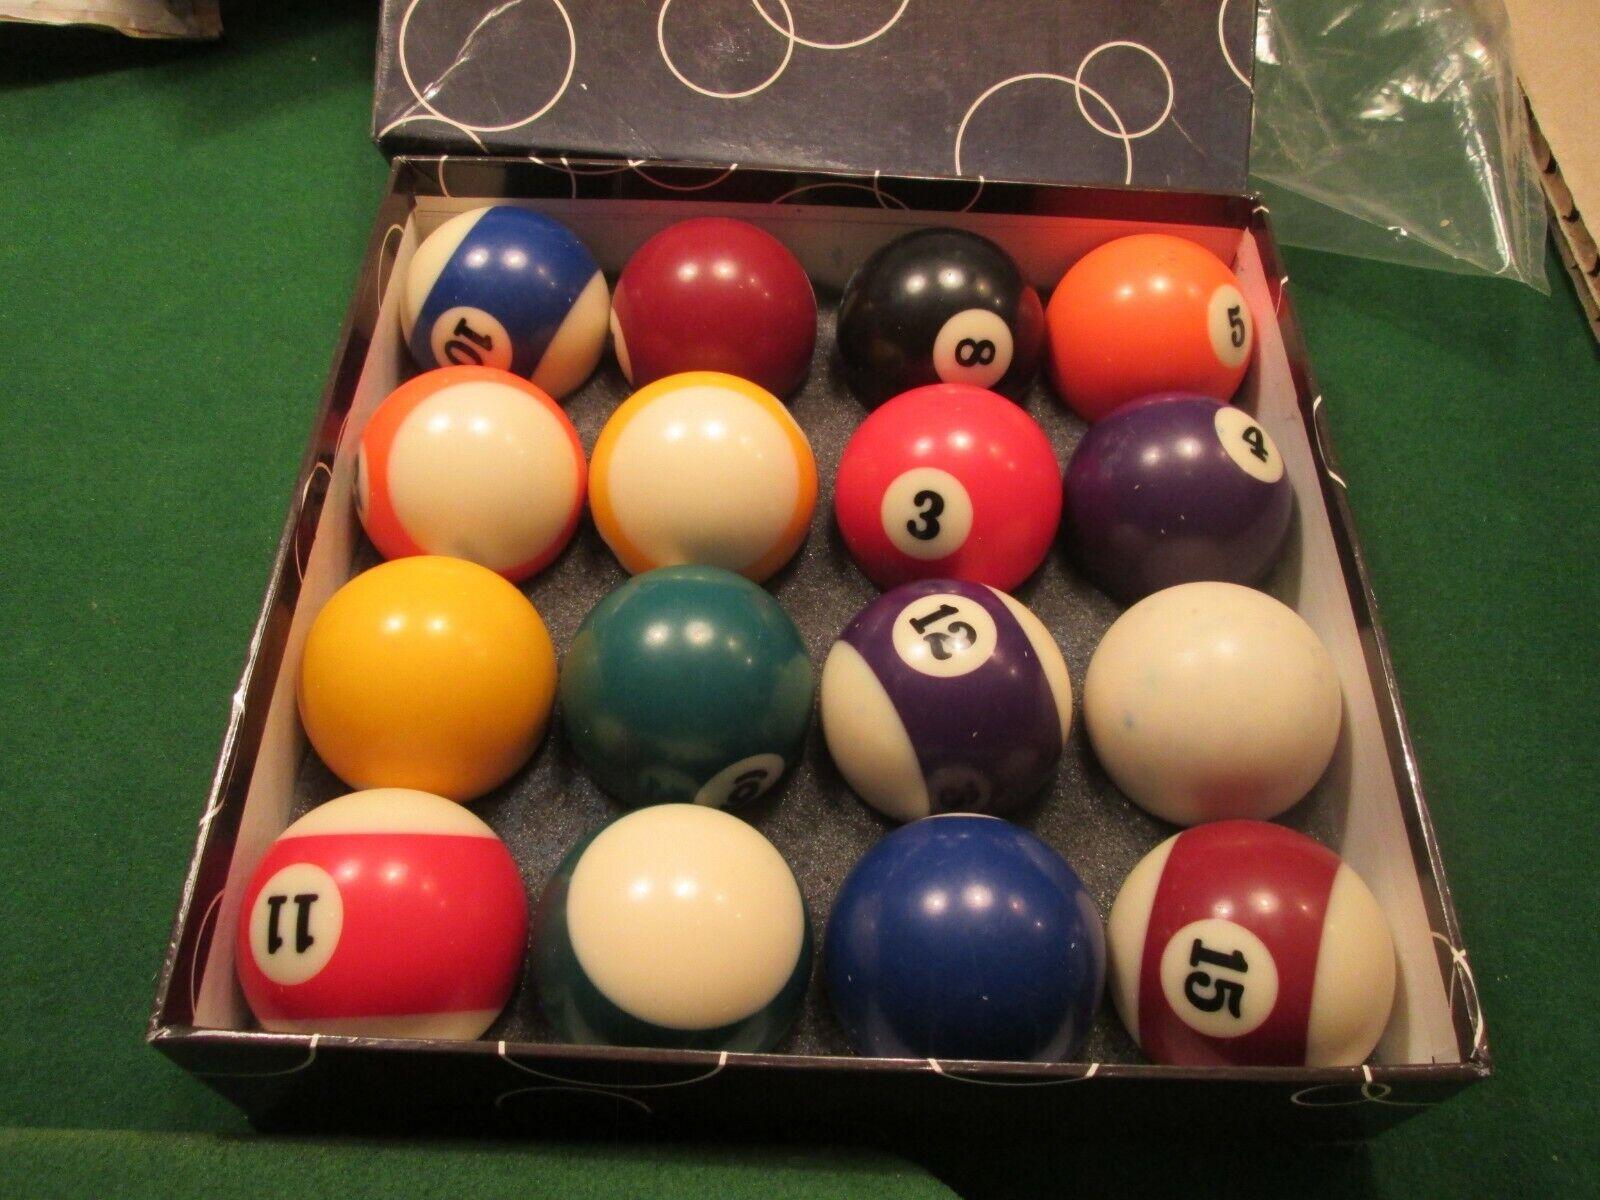 American Pool Balls Spots and Stripes 57 mm